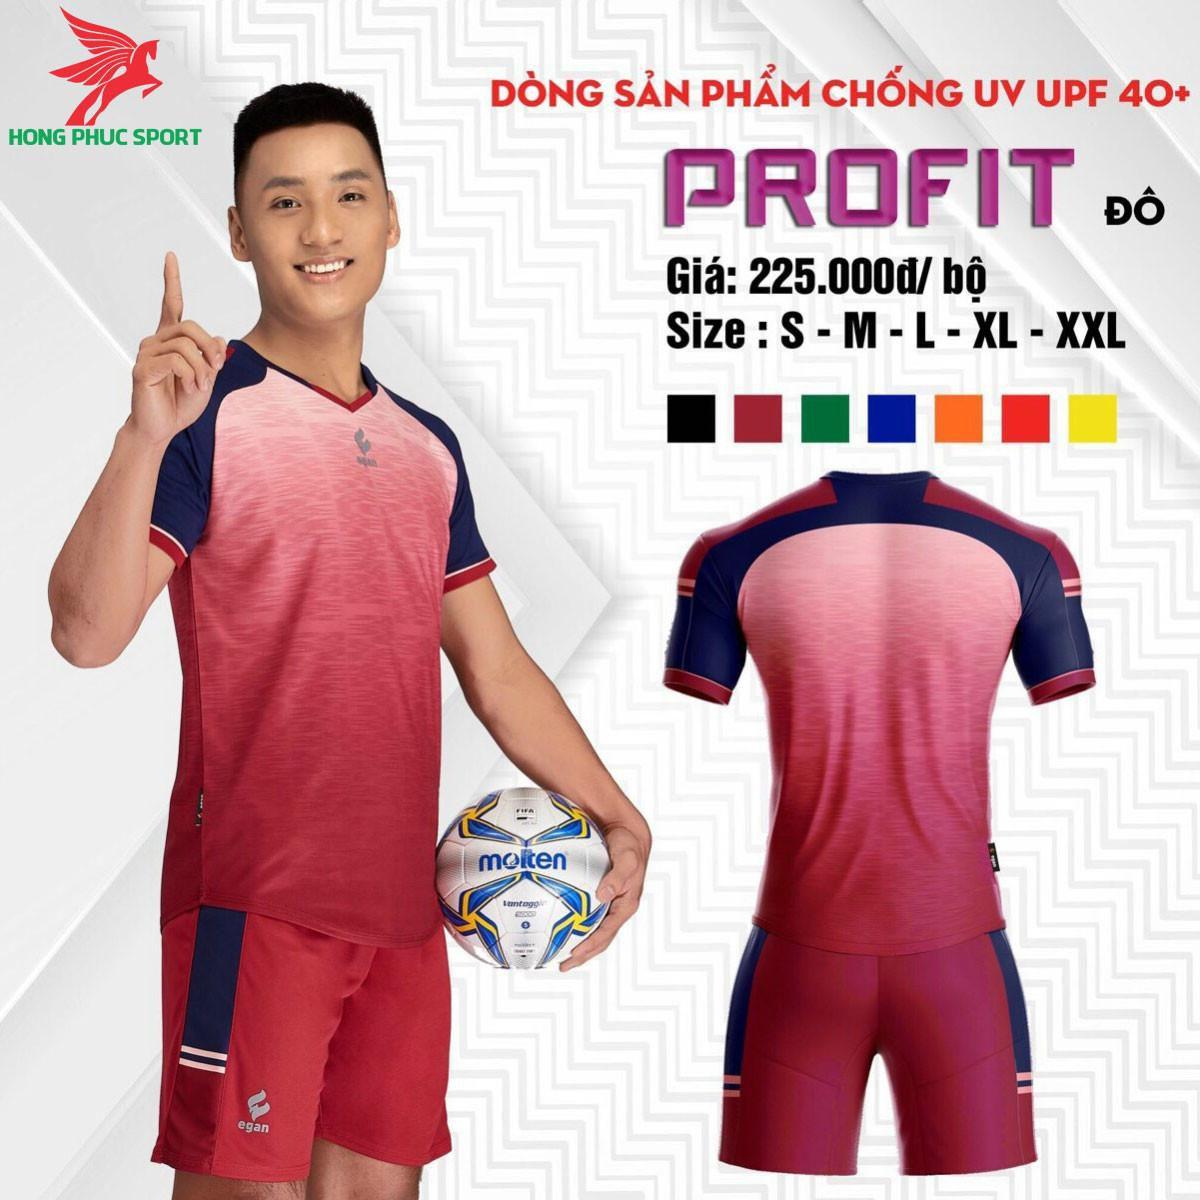 https://cdn.hongphucsport.com/unsafe/s4.shopbay.vn/files/285/ao-da-bong-khong-logo-egan-profit-mau-do-6050656a11303.jpg